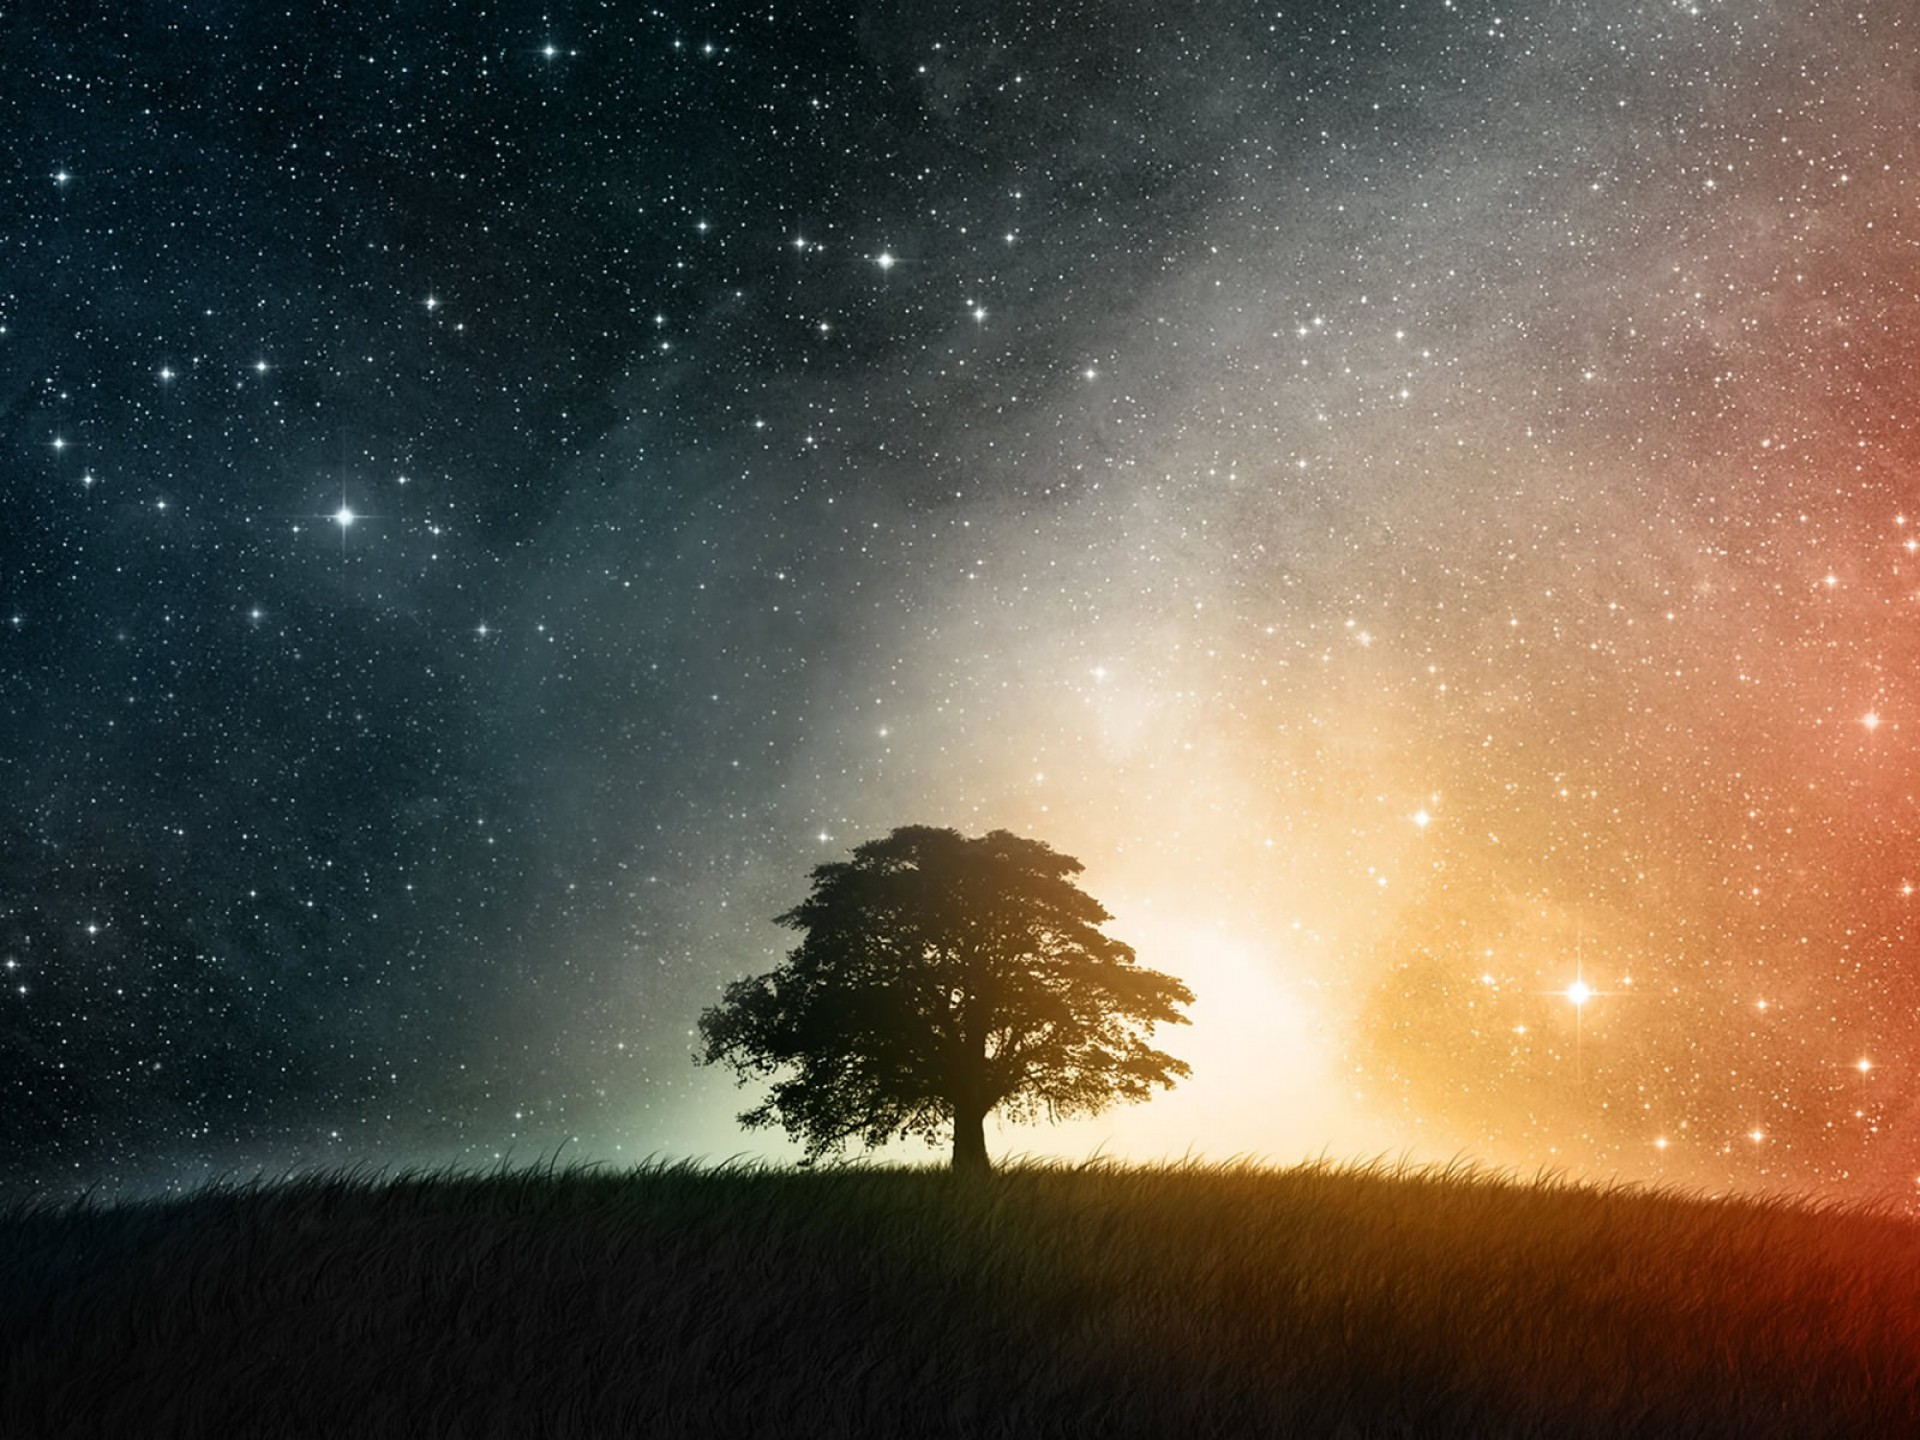 Starry Sky Desktop Images